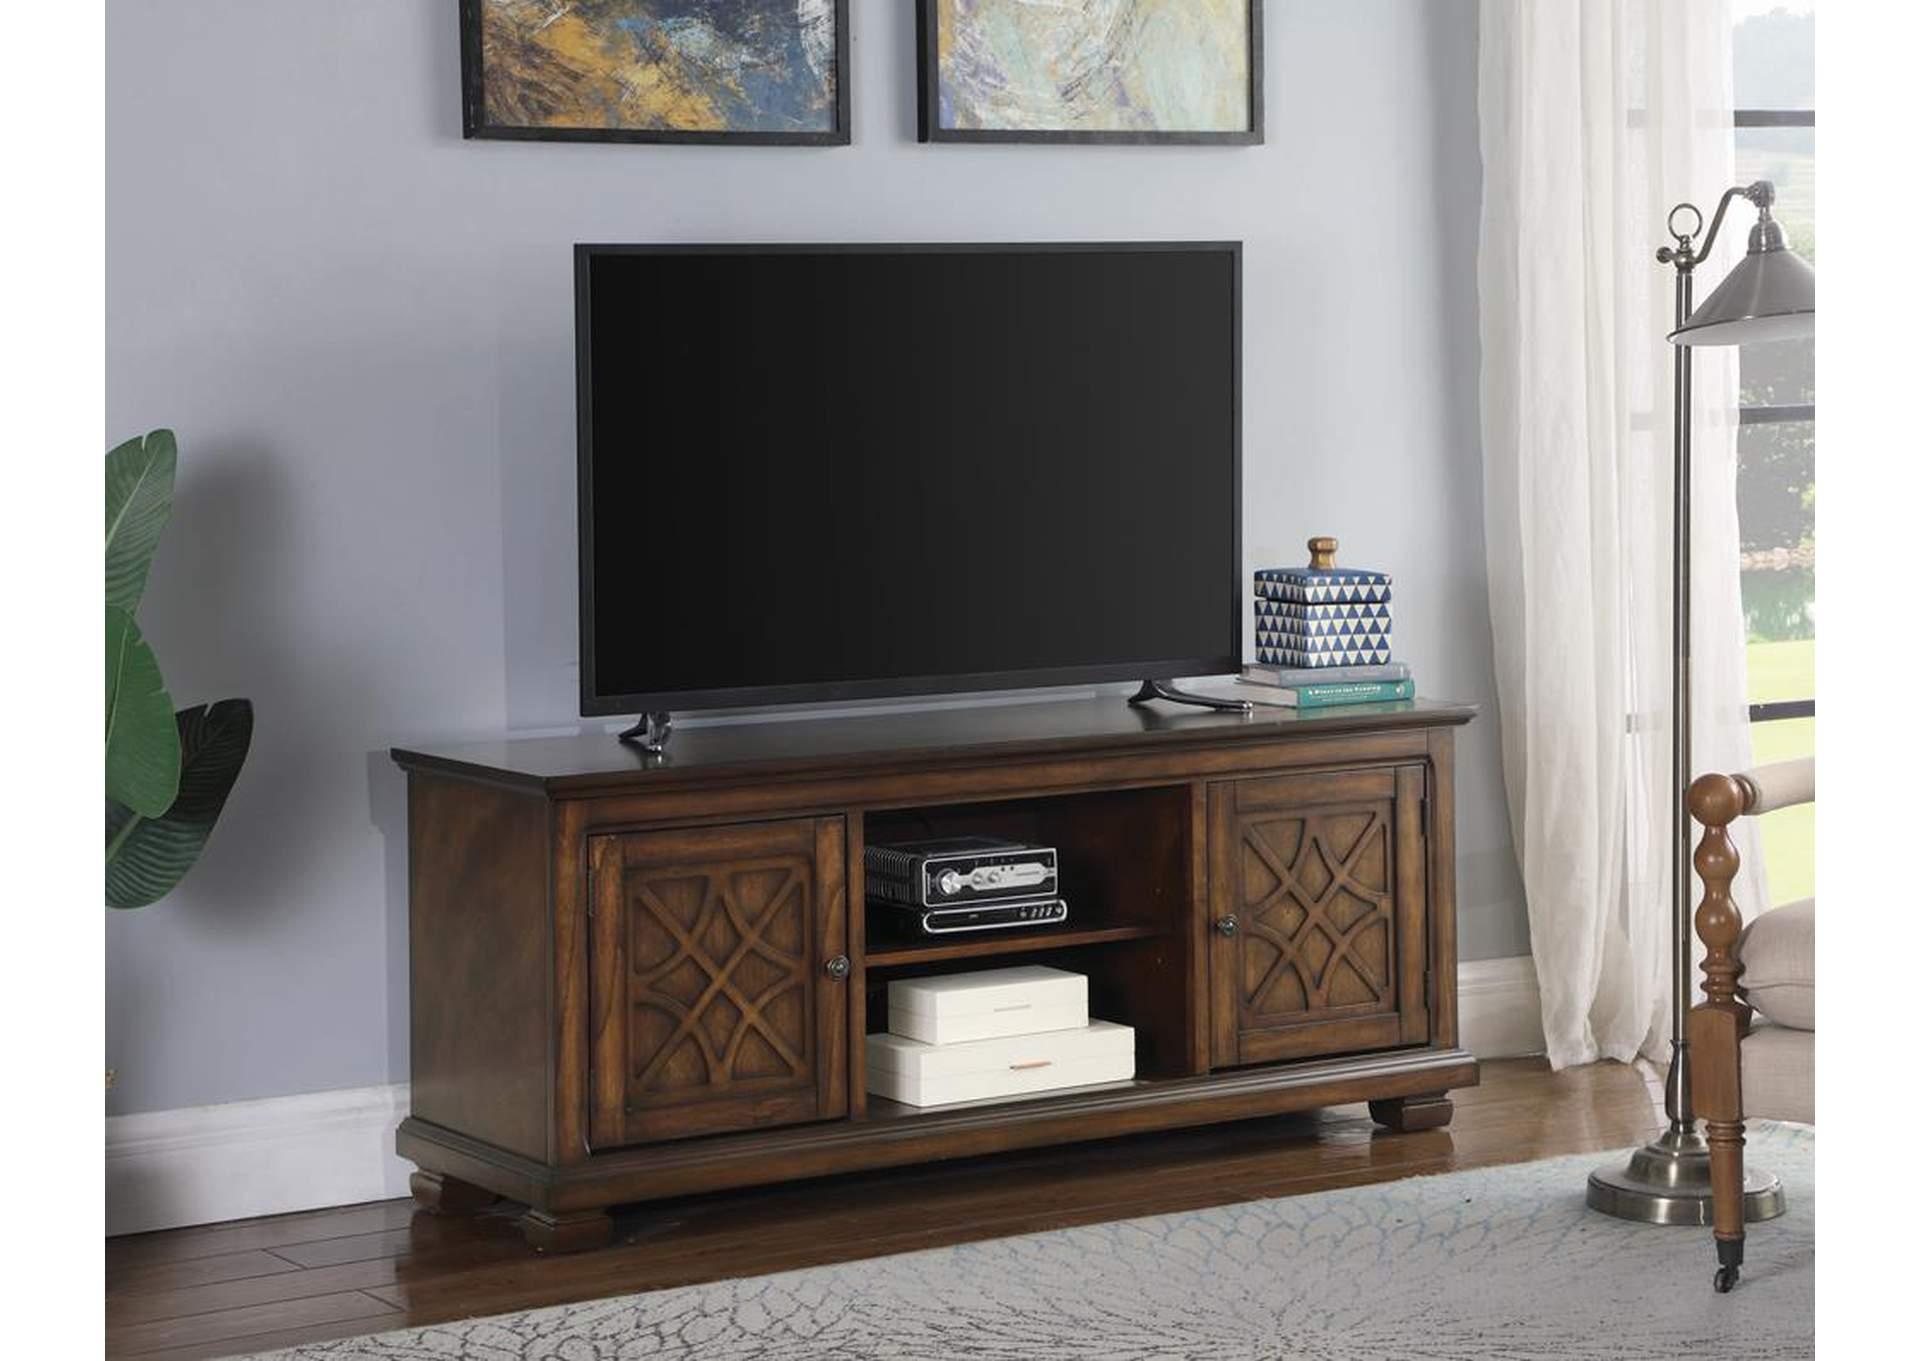 furniture plus westbury ny